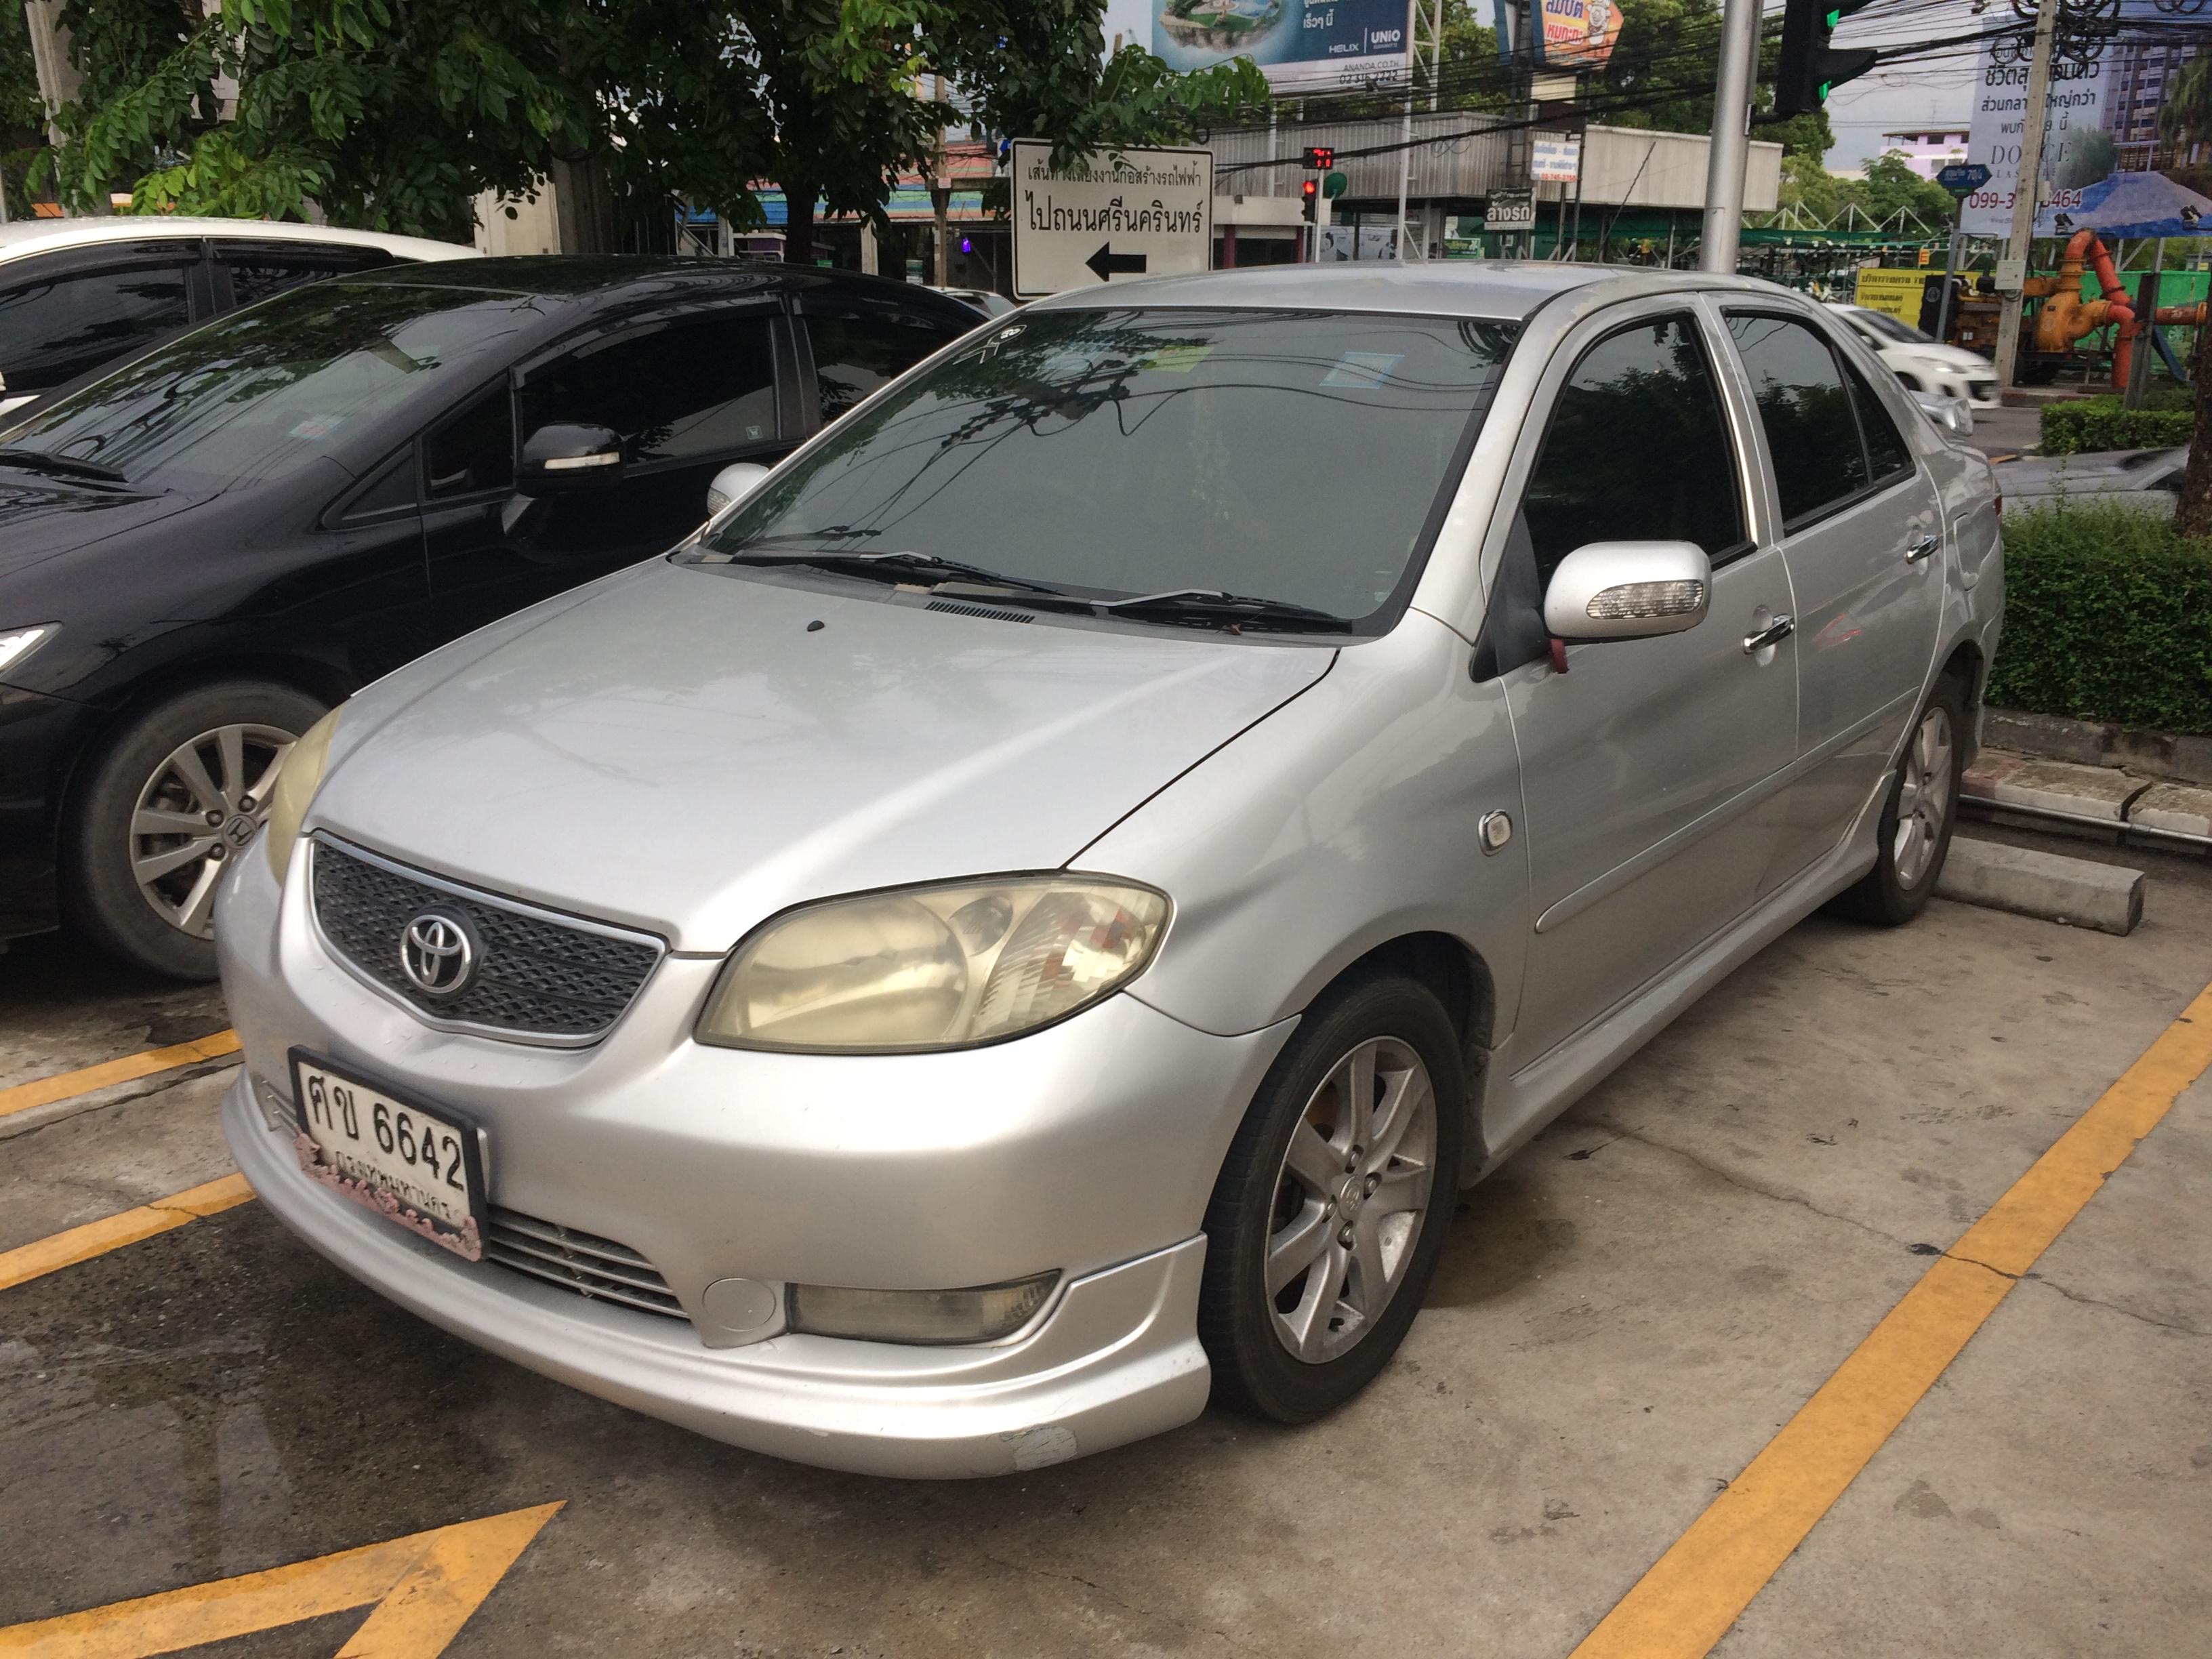 Kekurangan Toyota Vios 2004 Tangguh